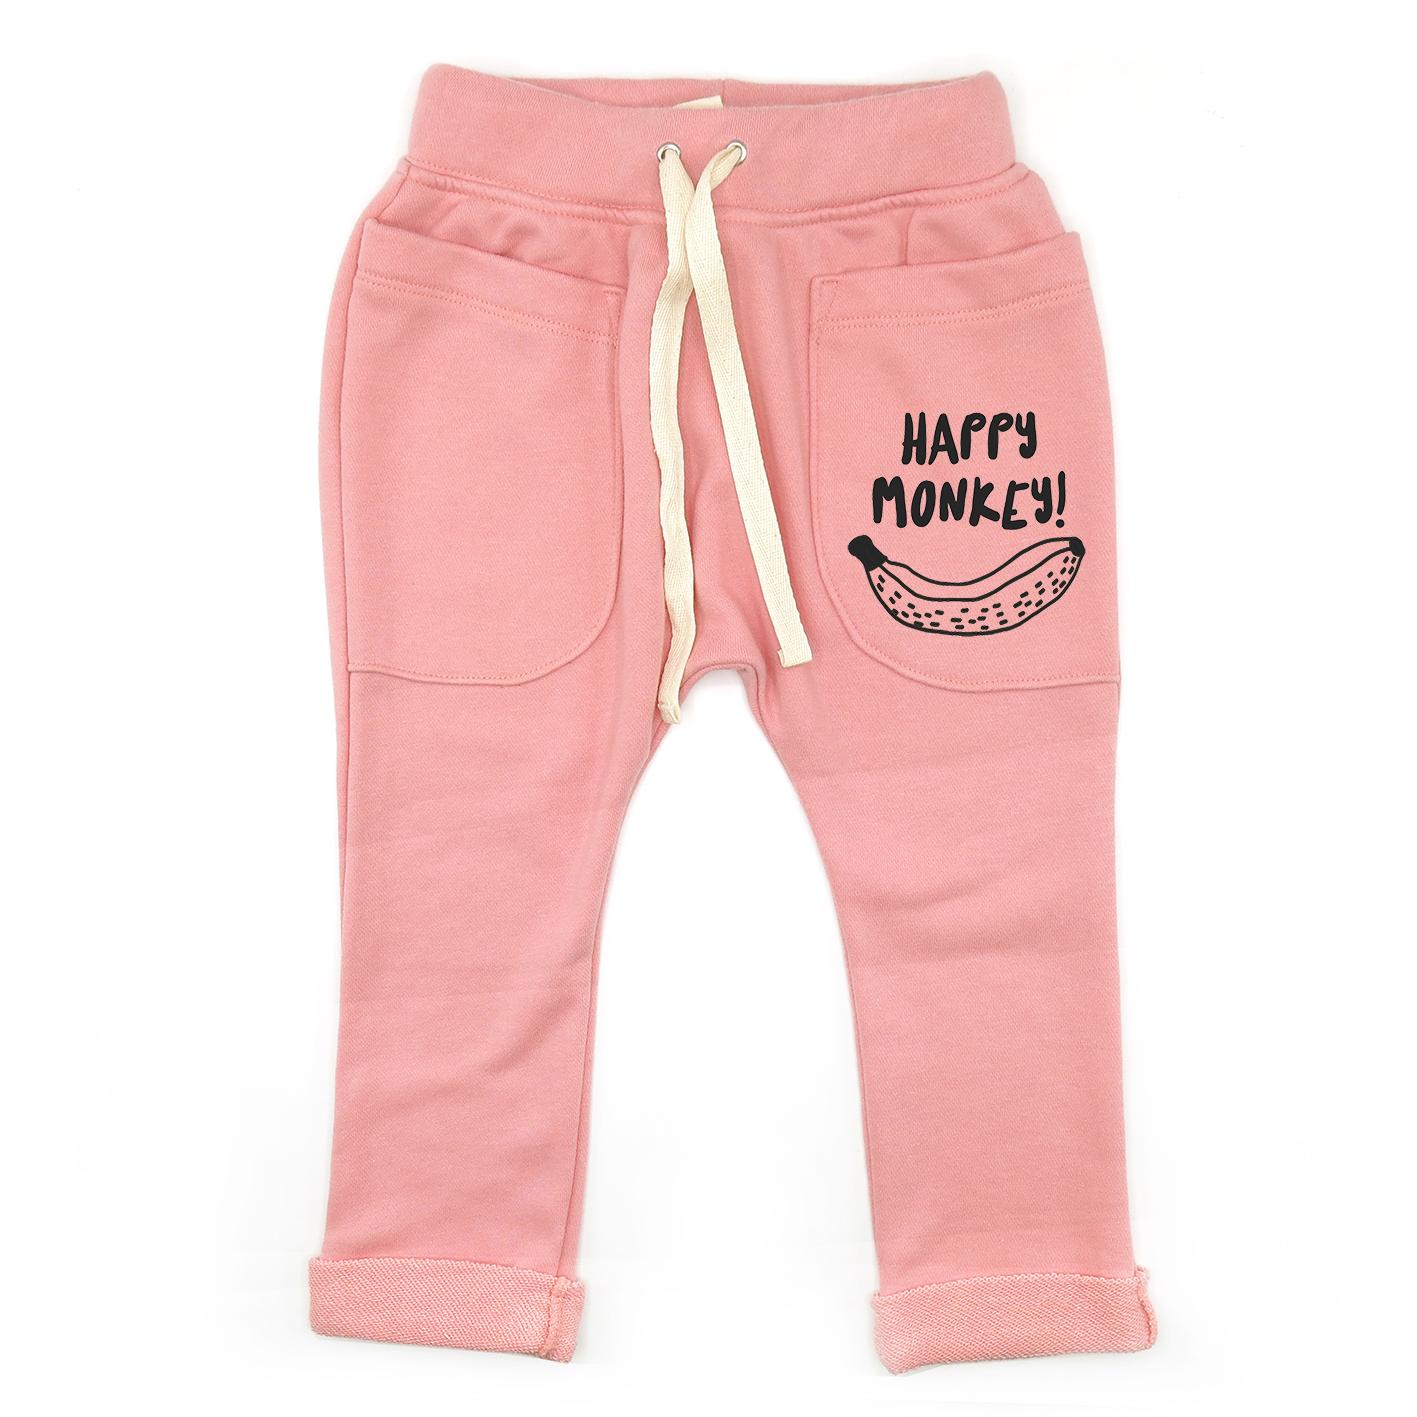 BABY&KIDS LP05130 [D] 0M.-7Y .HAPPY MONKEY ROLL UP SLOUCH PANTS